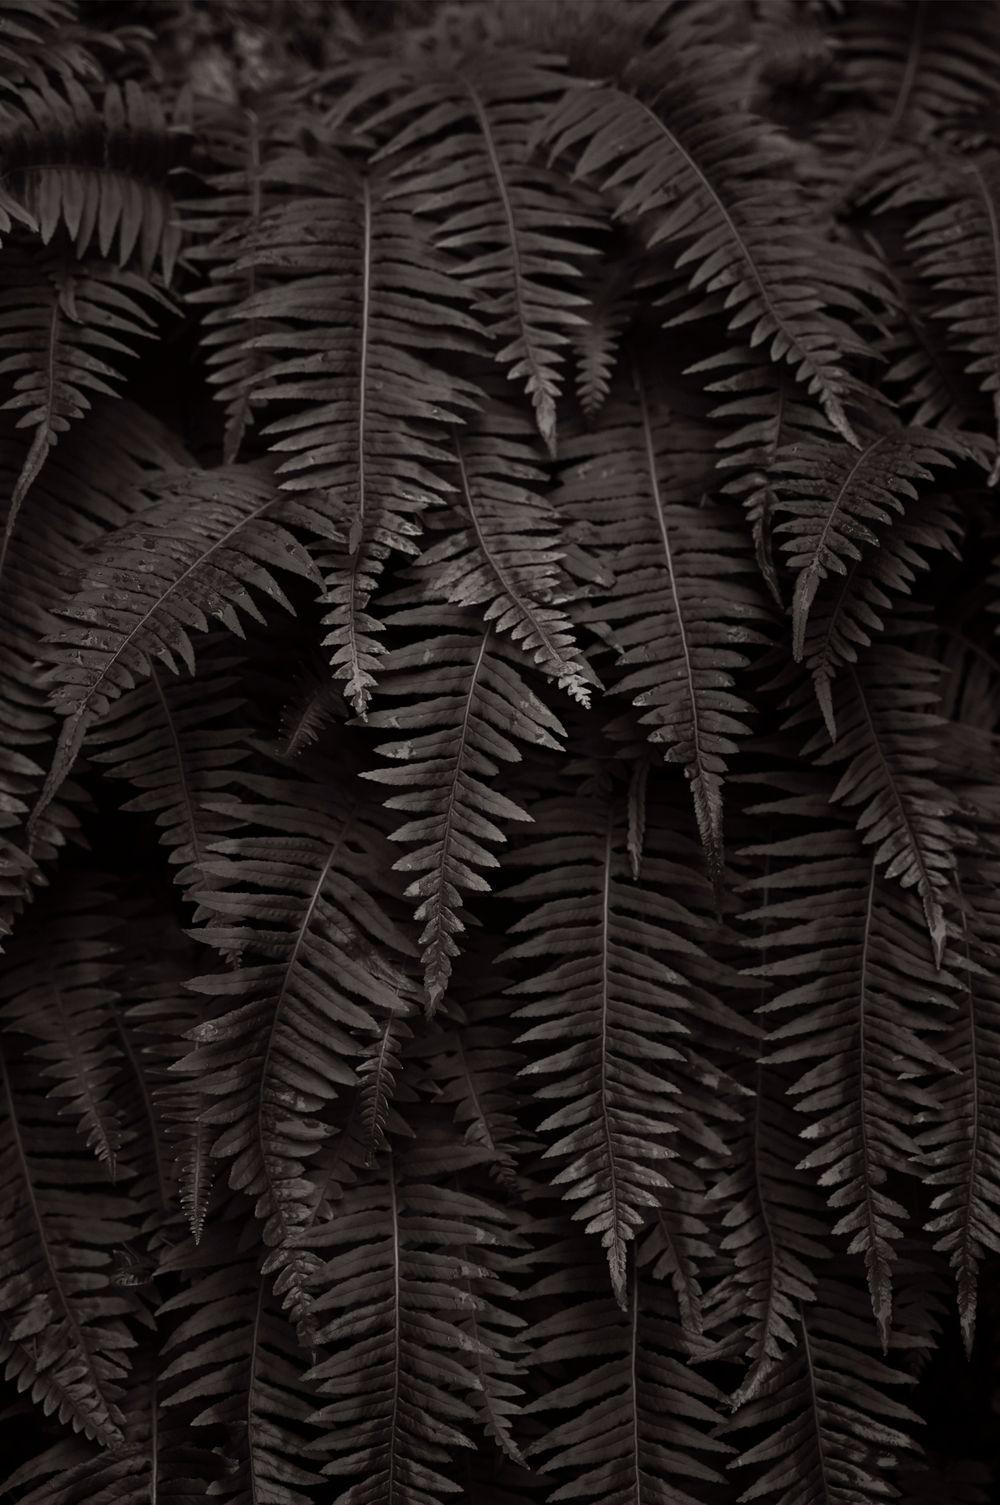 Americas-West-Drew-Doggett-Natures-Fabric.jpg